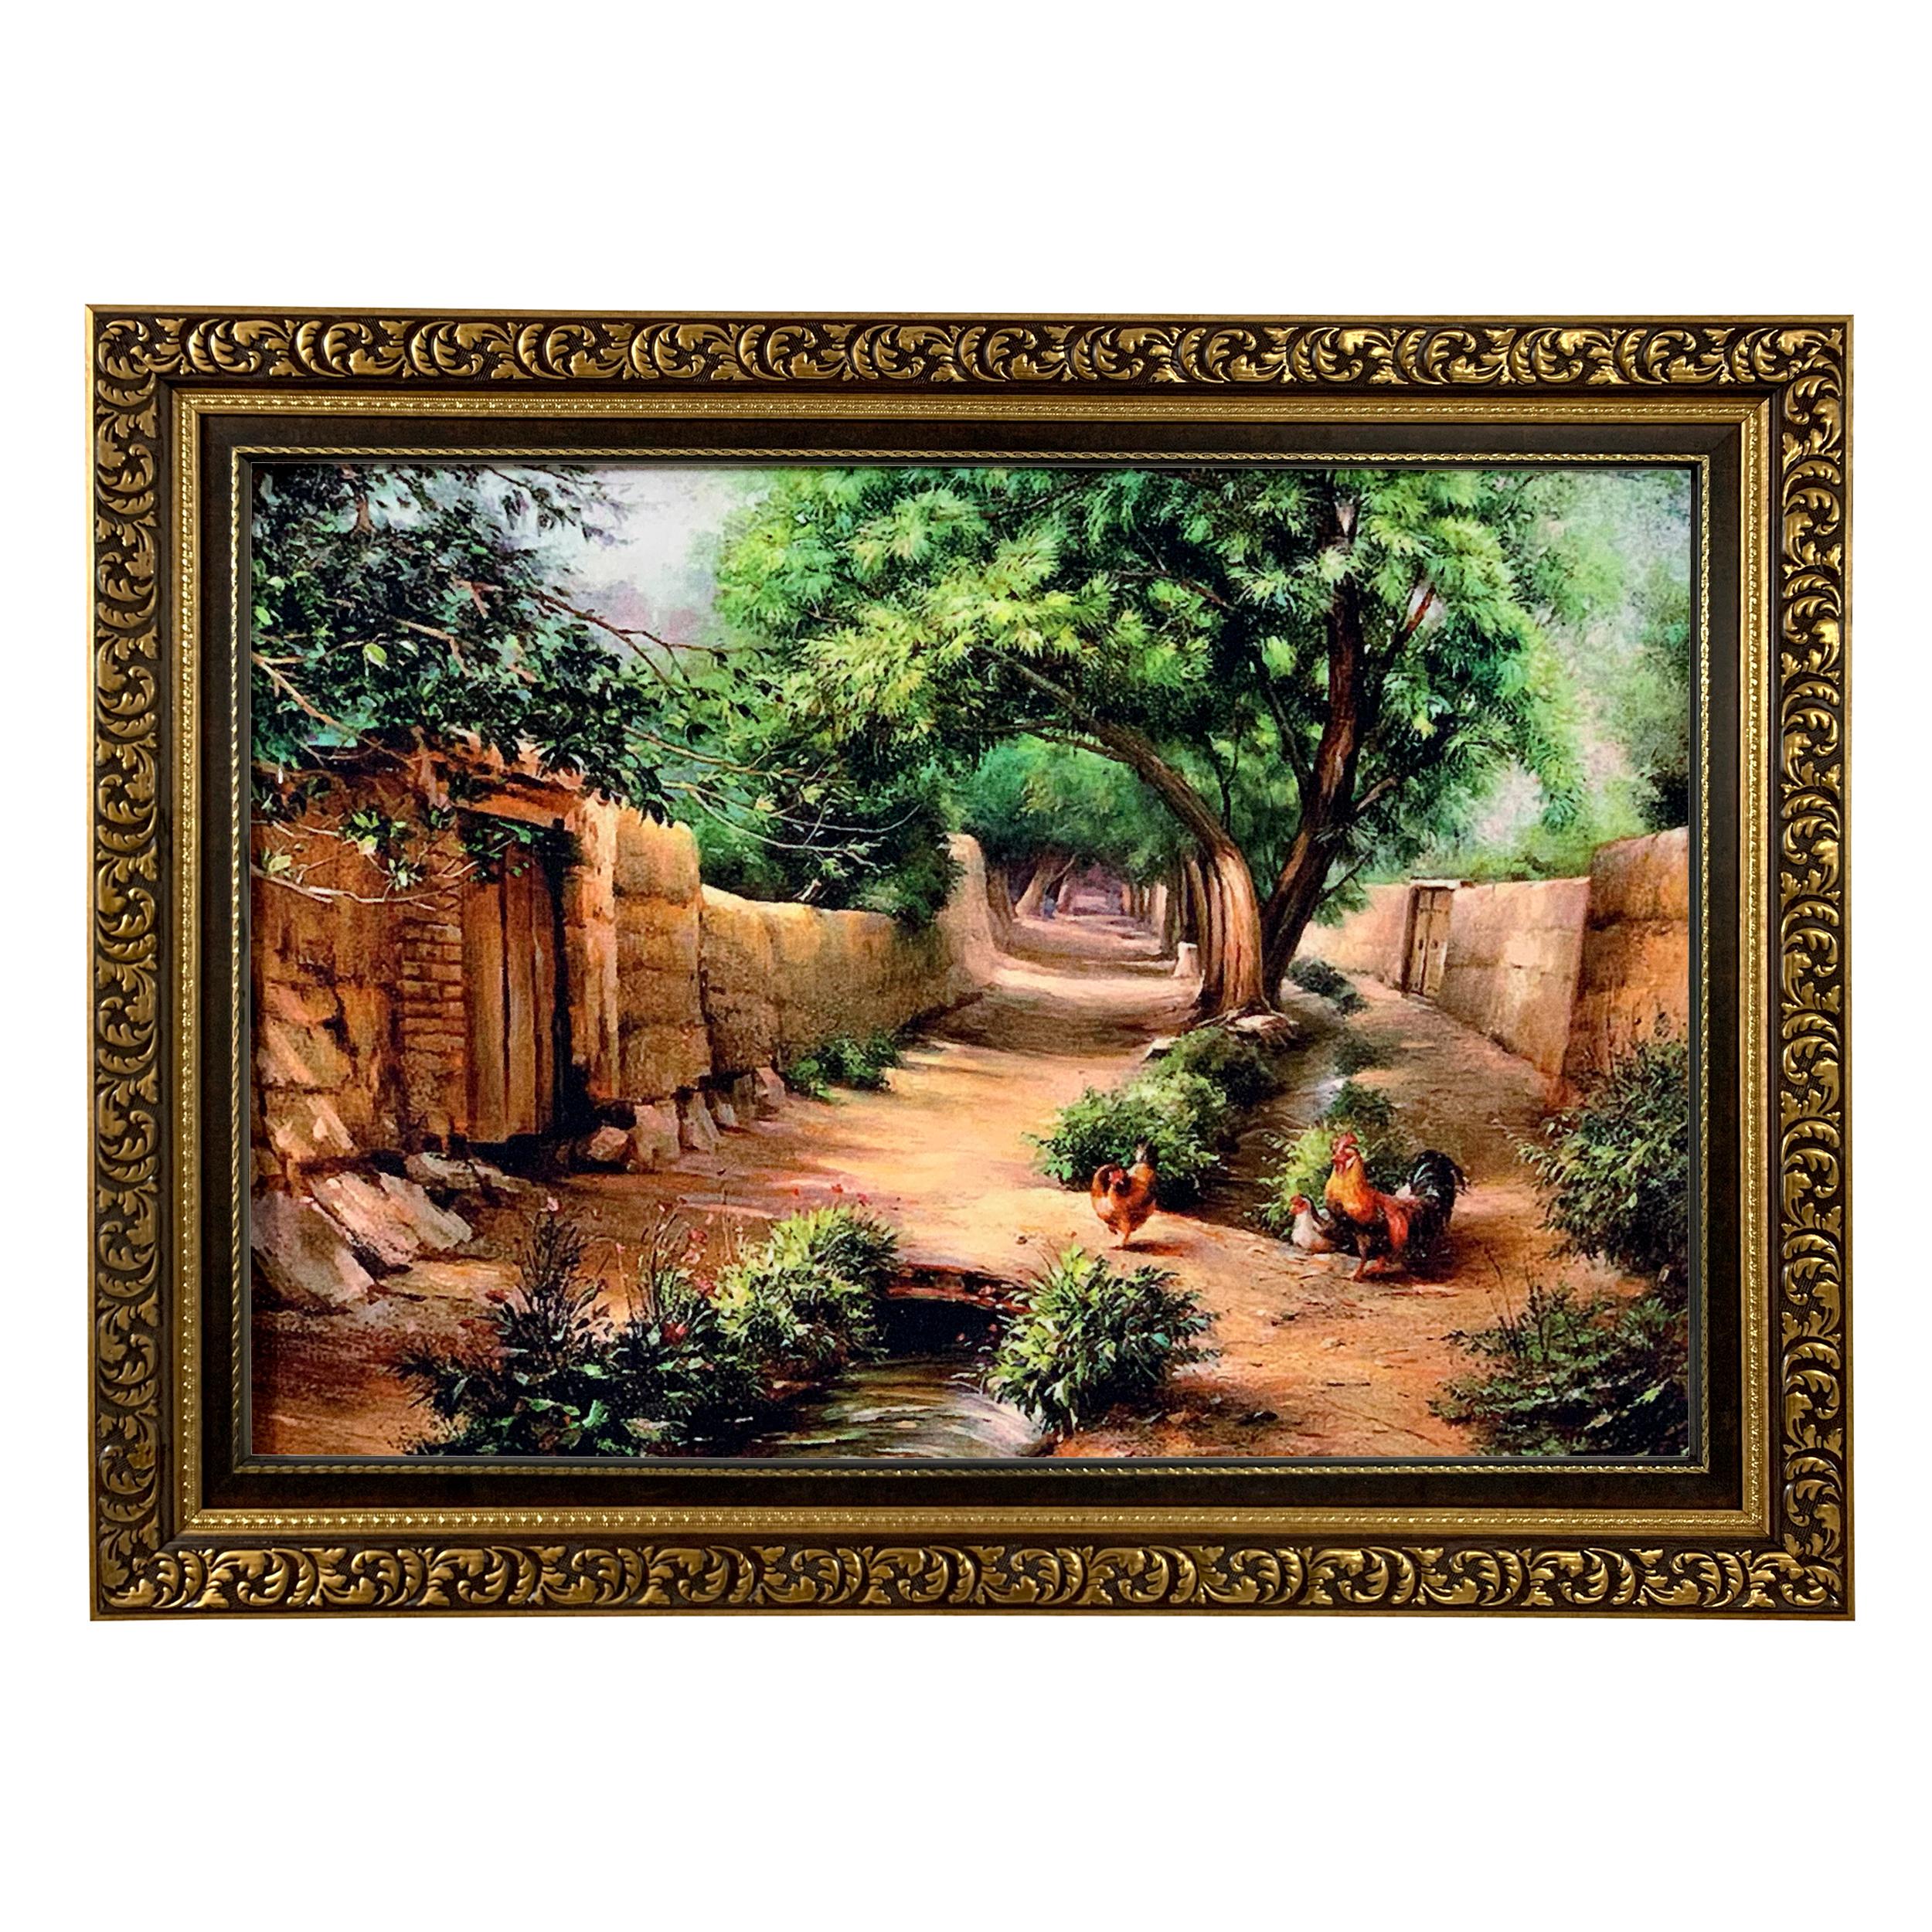 تابلو فرش ماشینی طرح کوچه باغ کد ۷۳۳۳